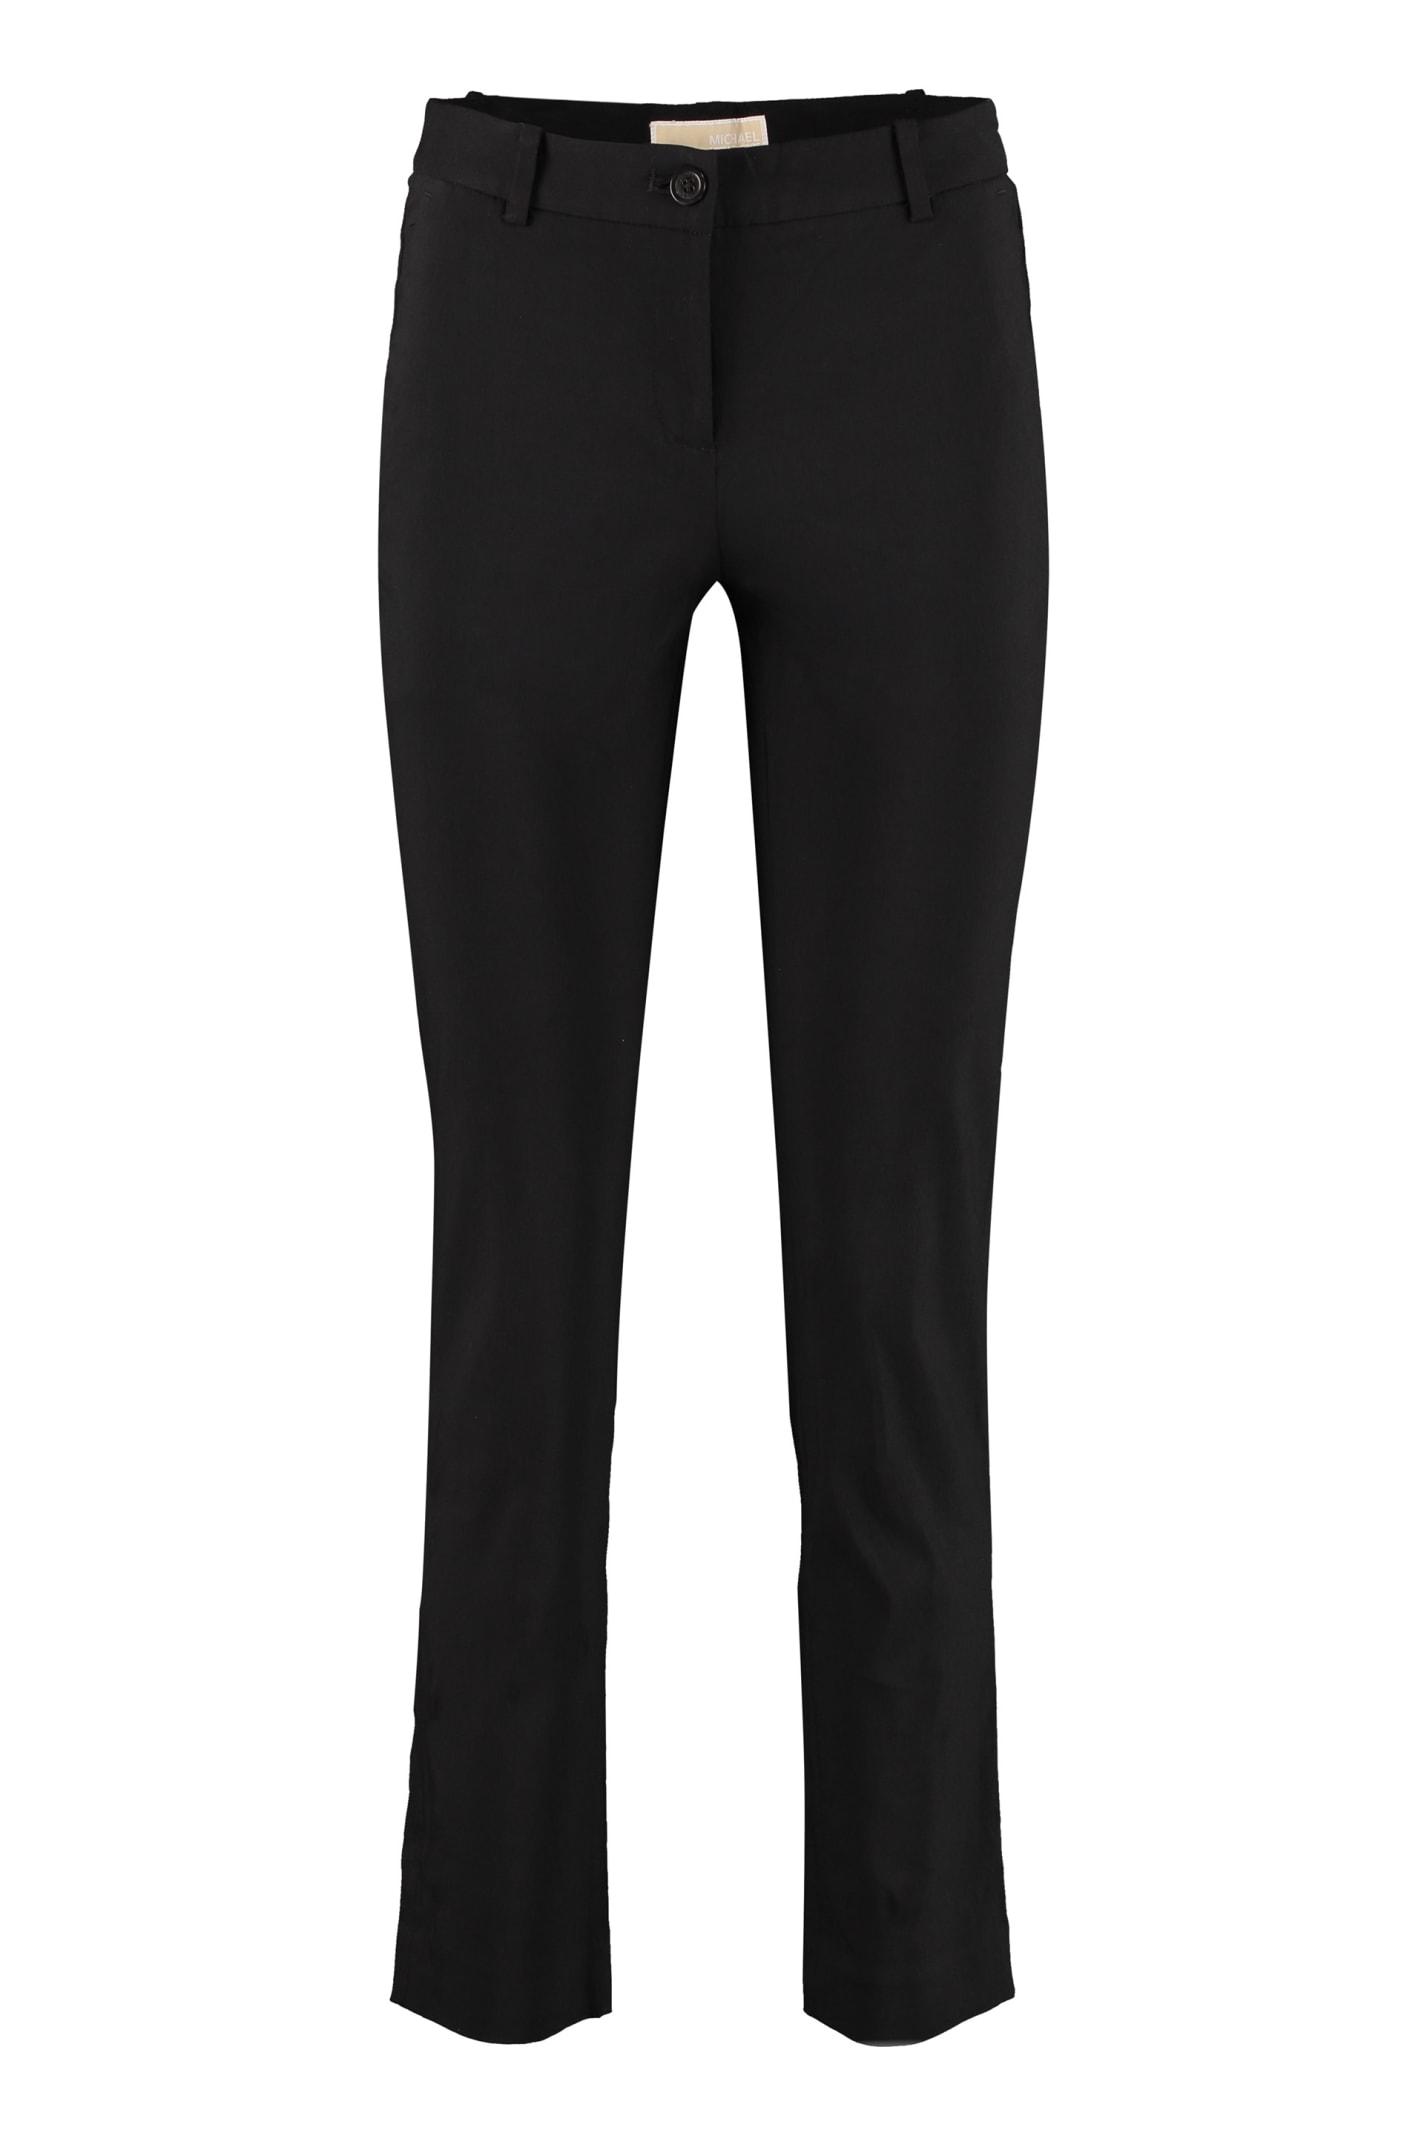 Michael Michael Kors Miranda Cropped Trousers In Black